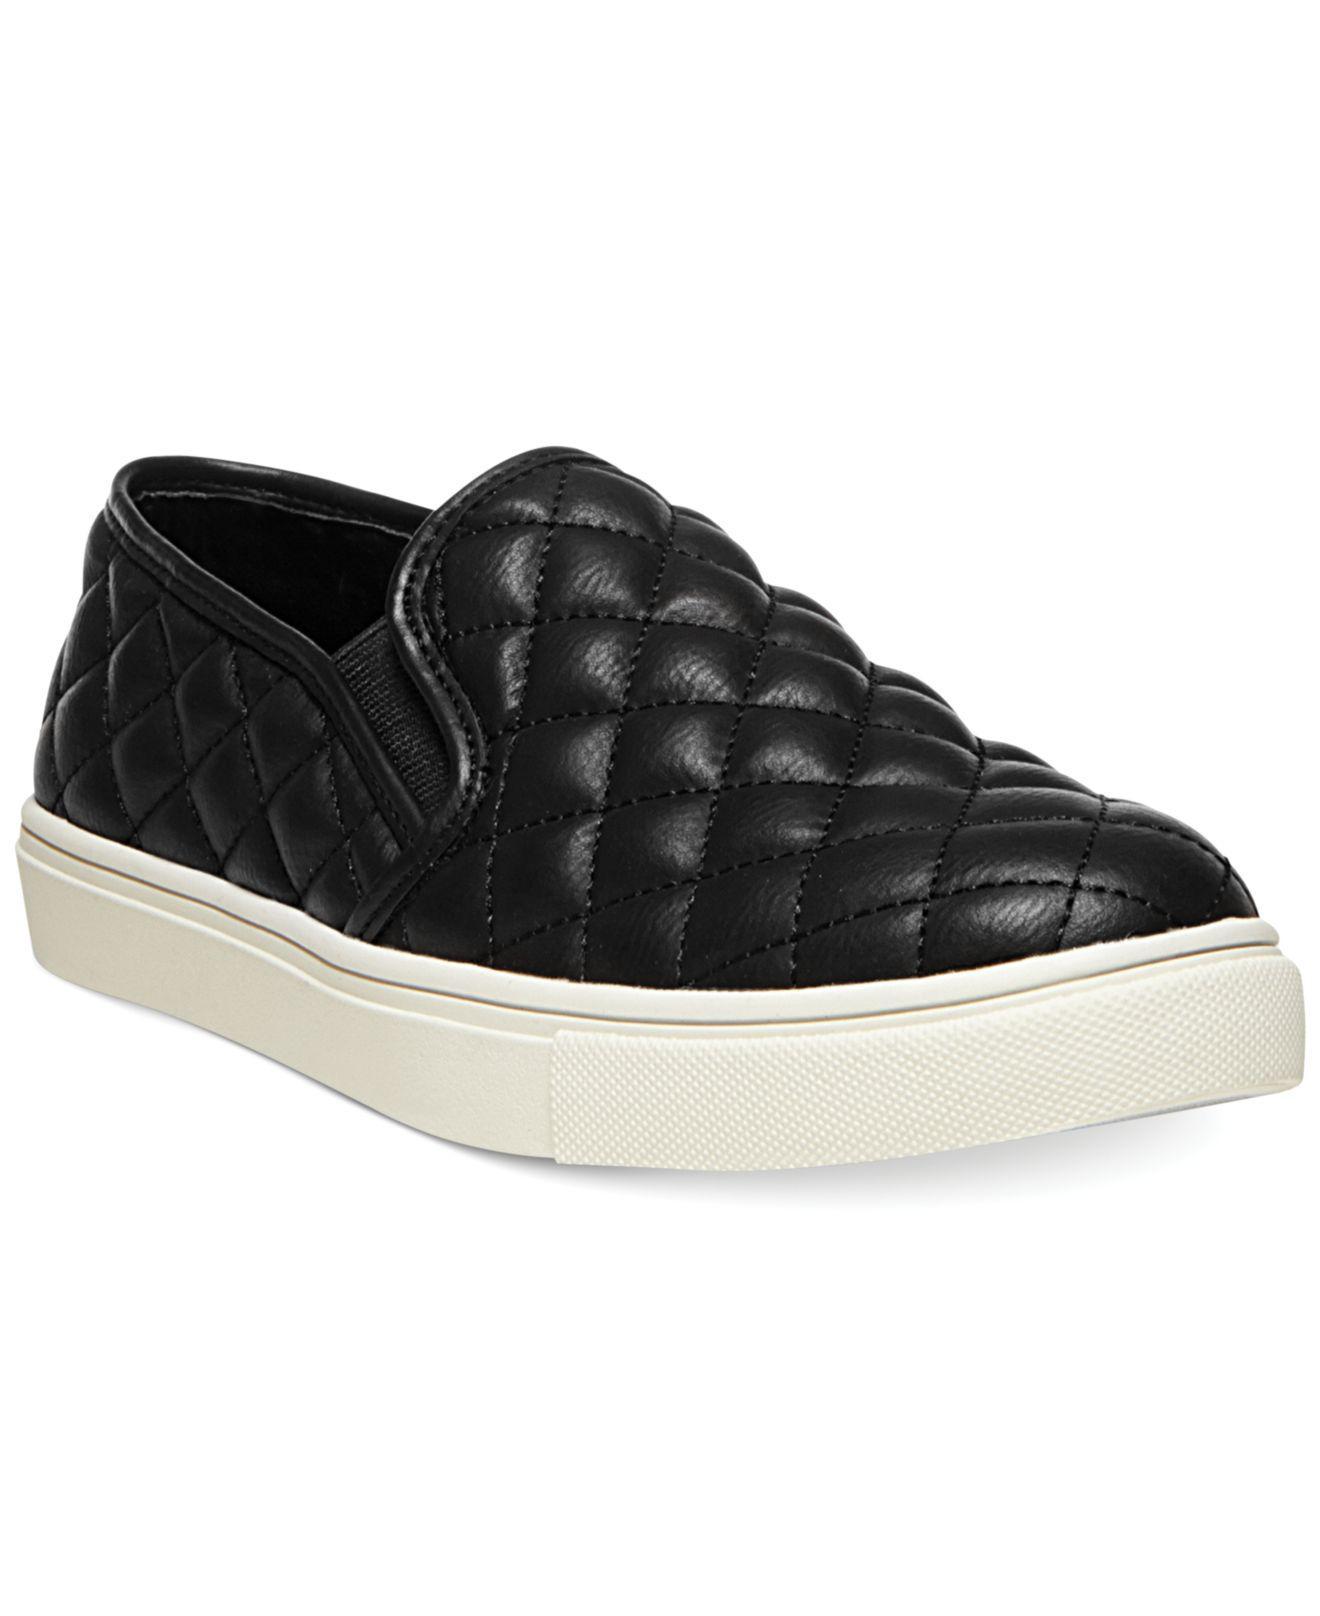 227f0bebc56 Lyst - Steve Madden Ecentrc-q Platform Sneakers in Black - Save  59.42028985507246%